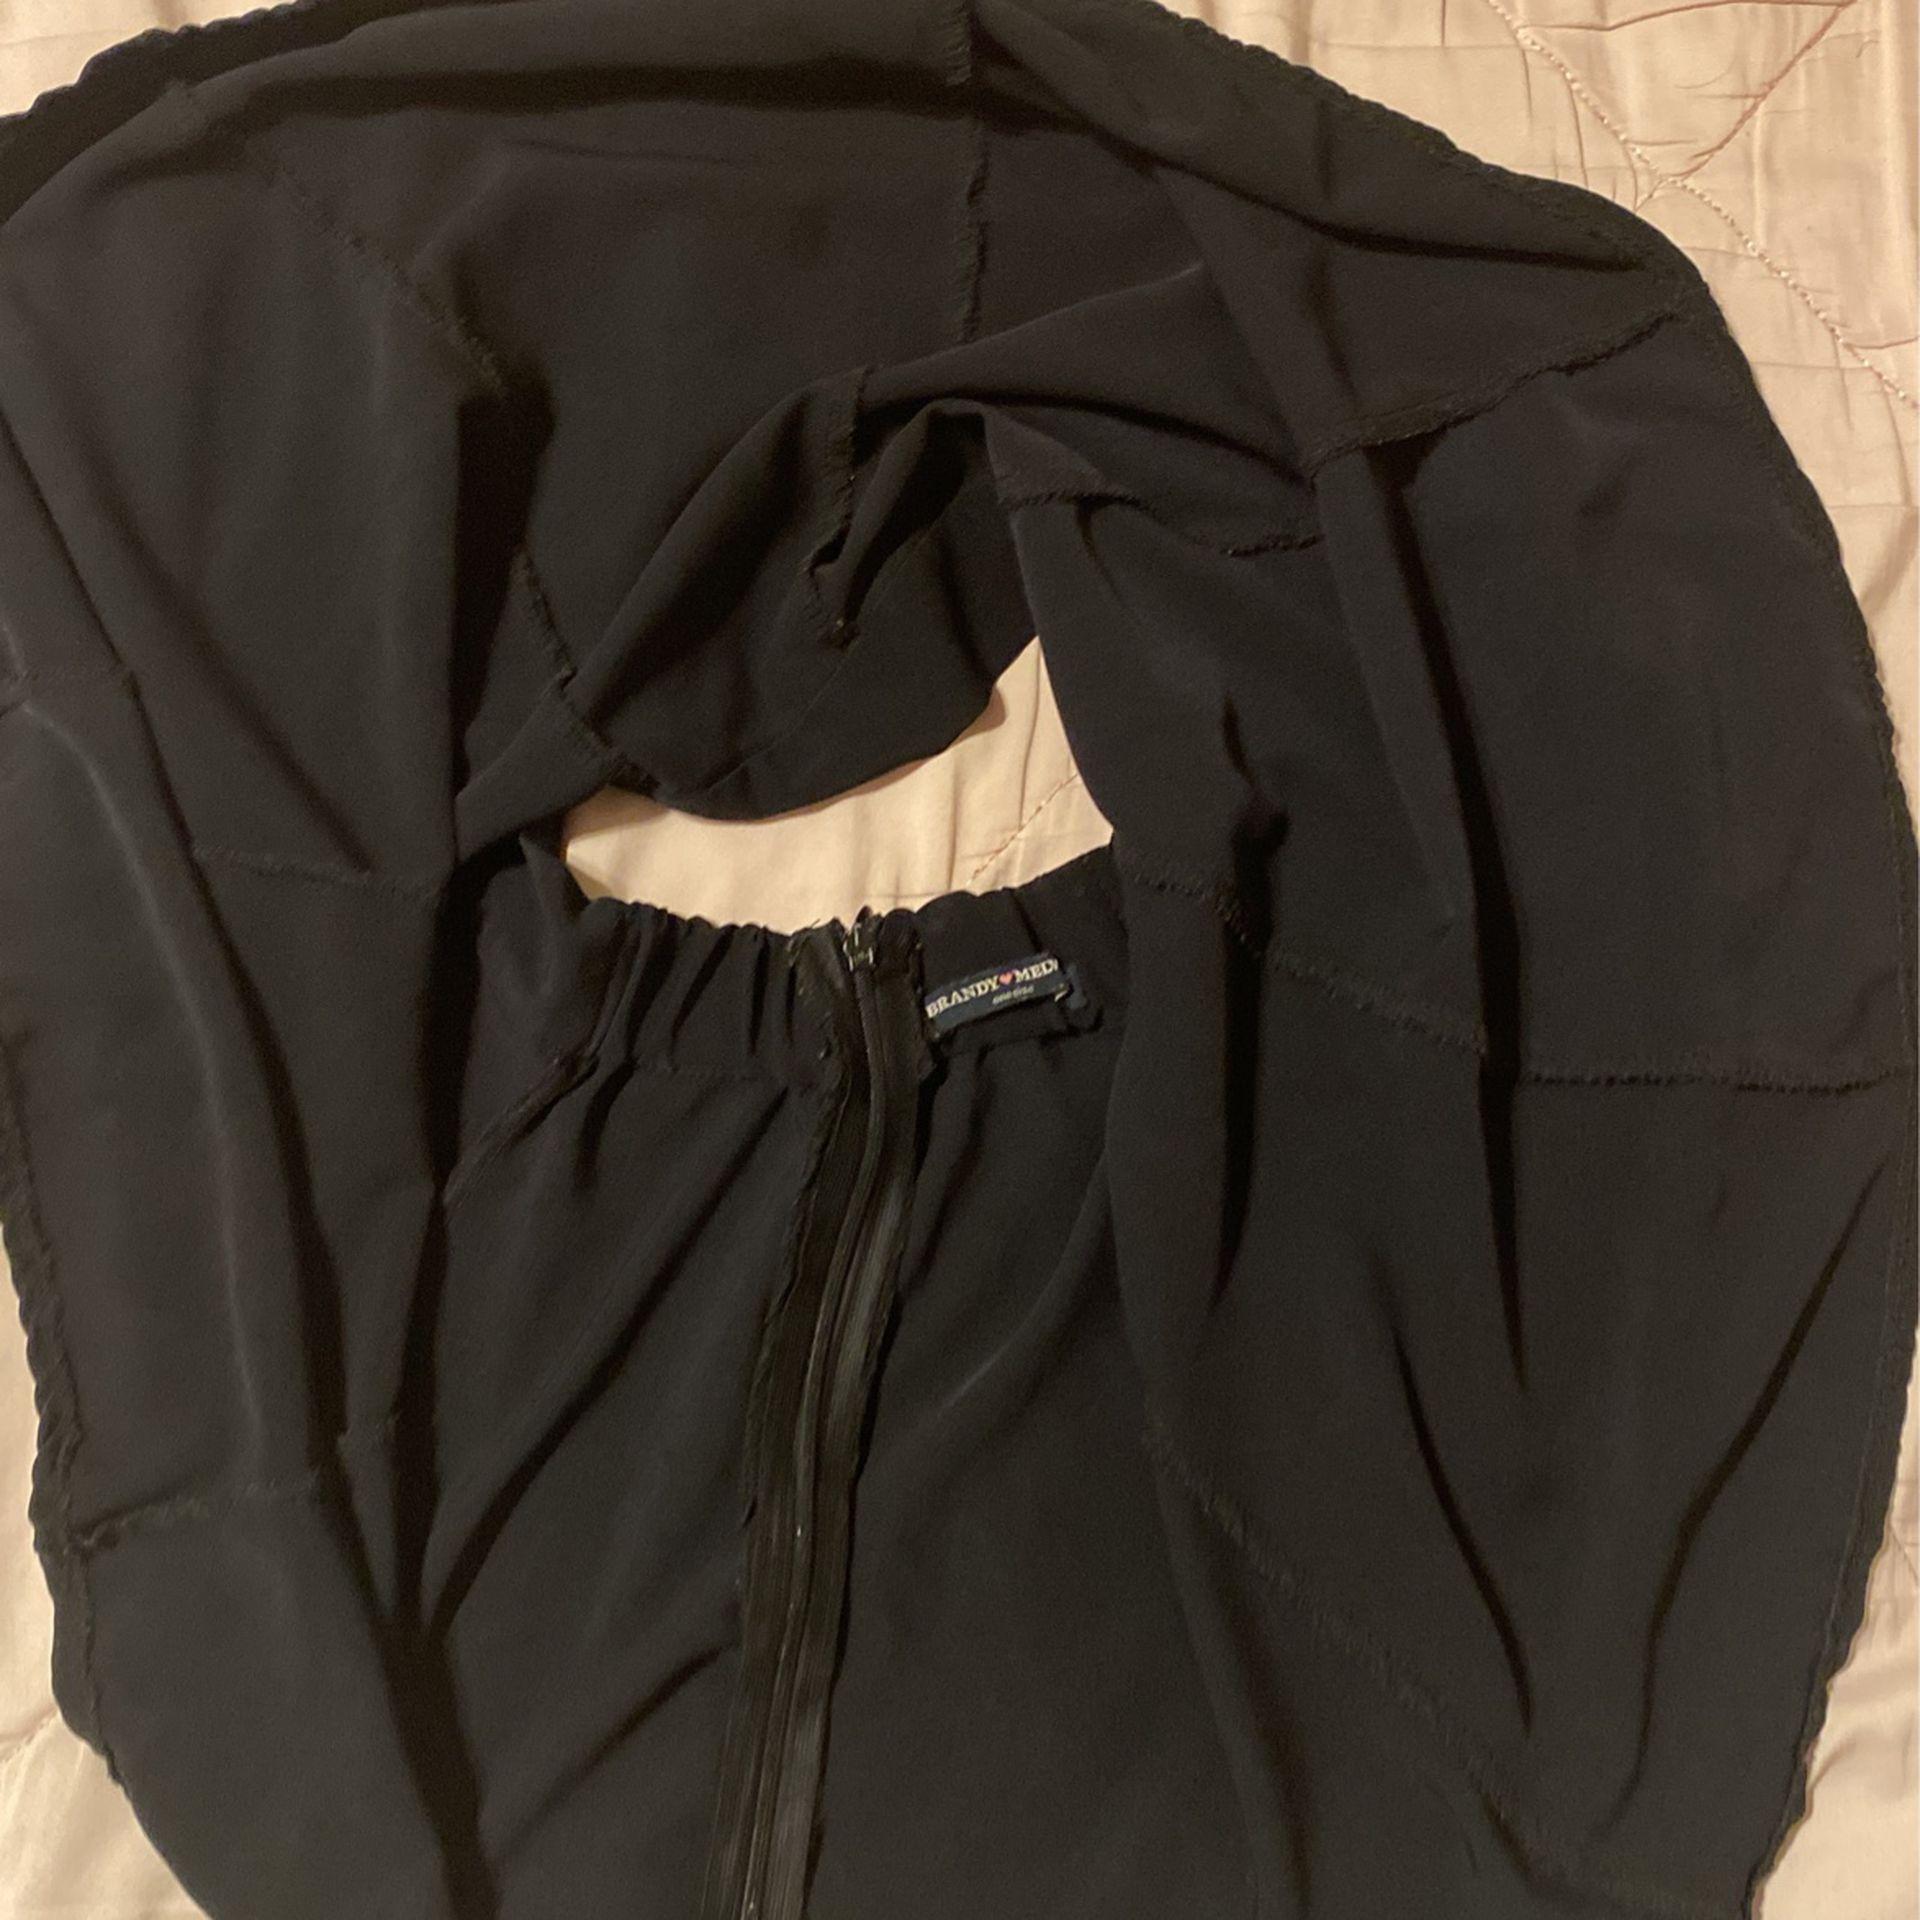 Sweats/skirt